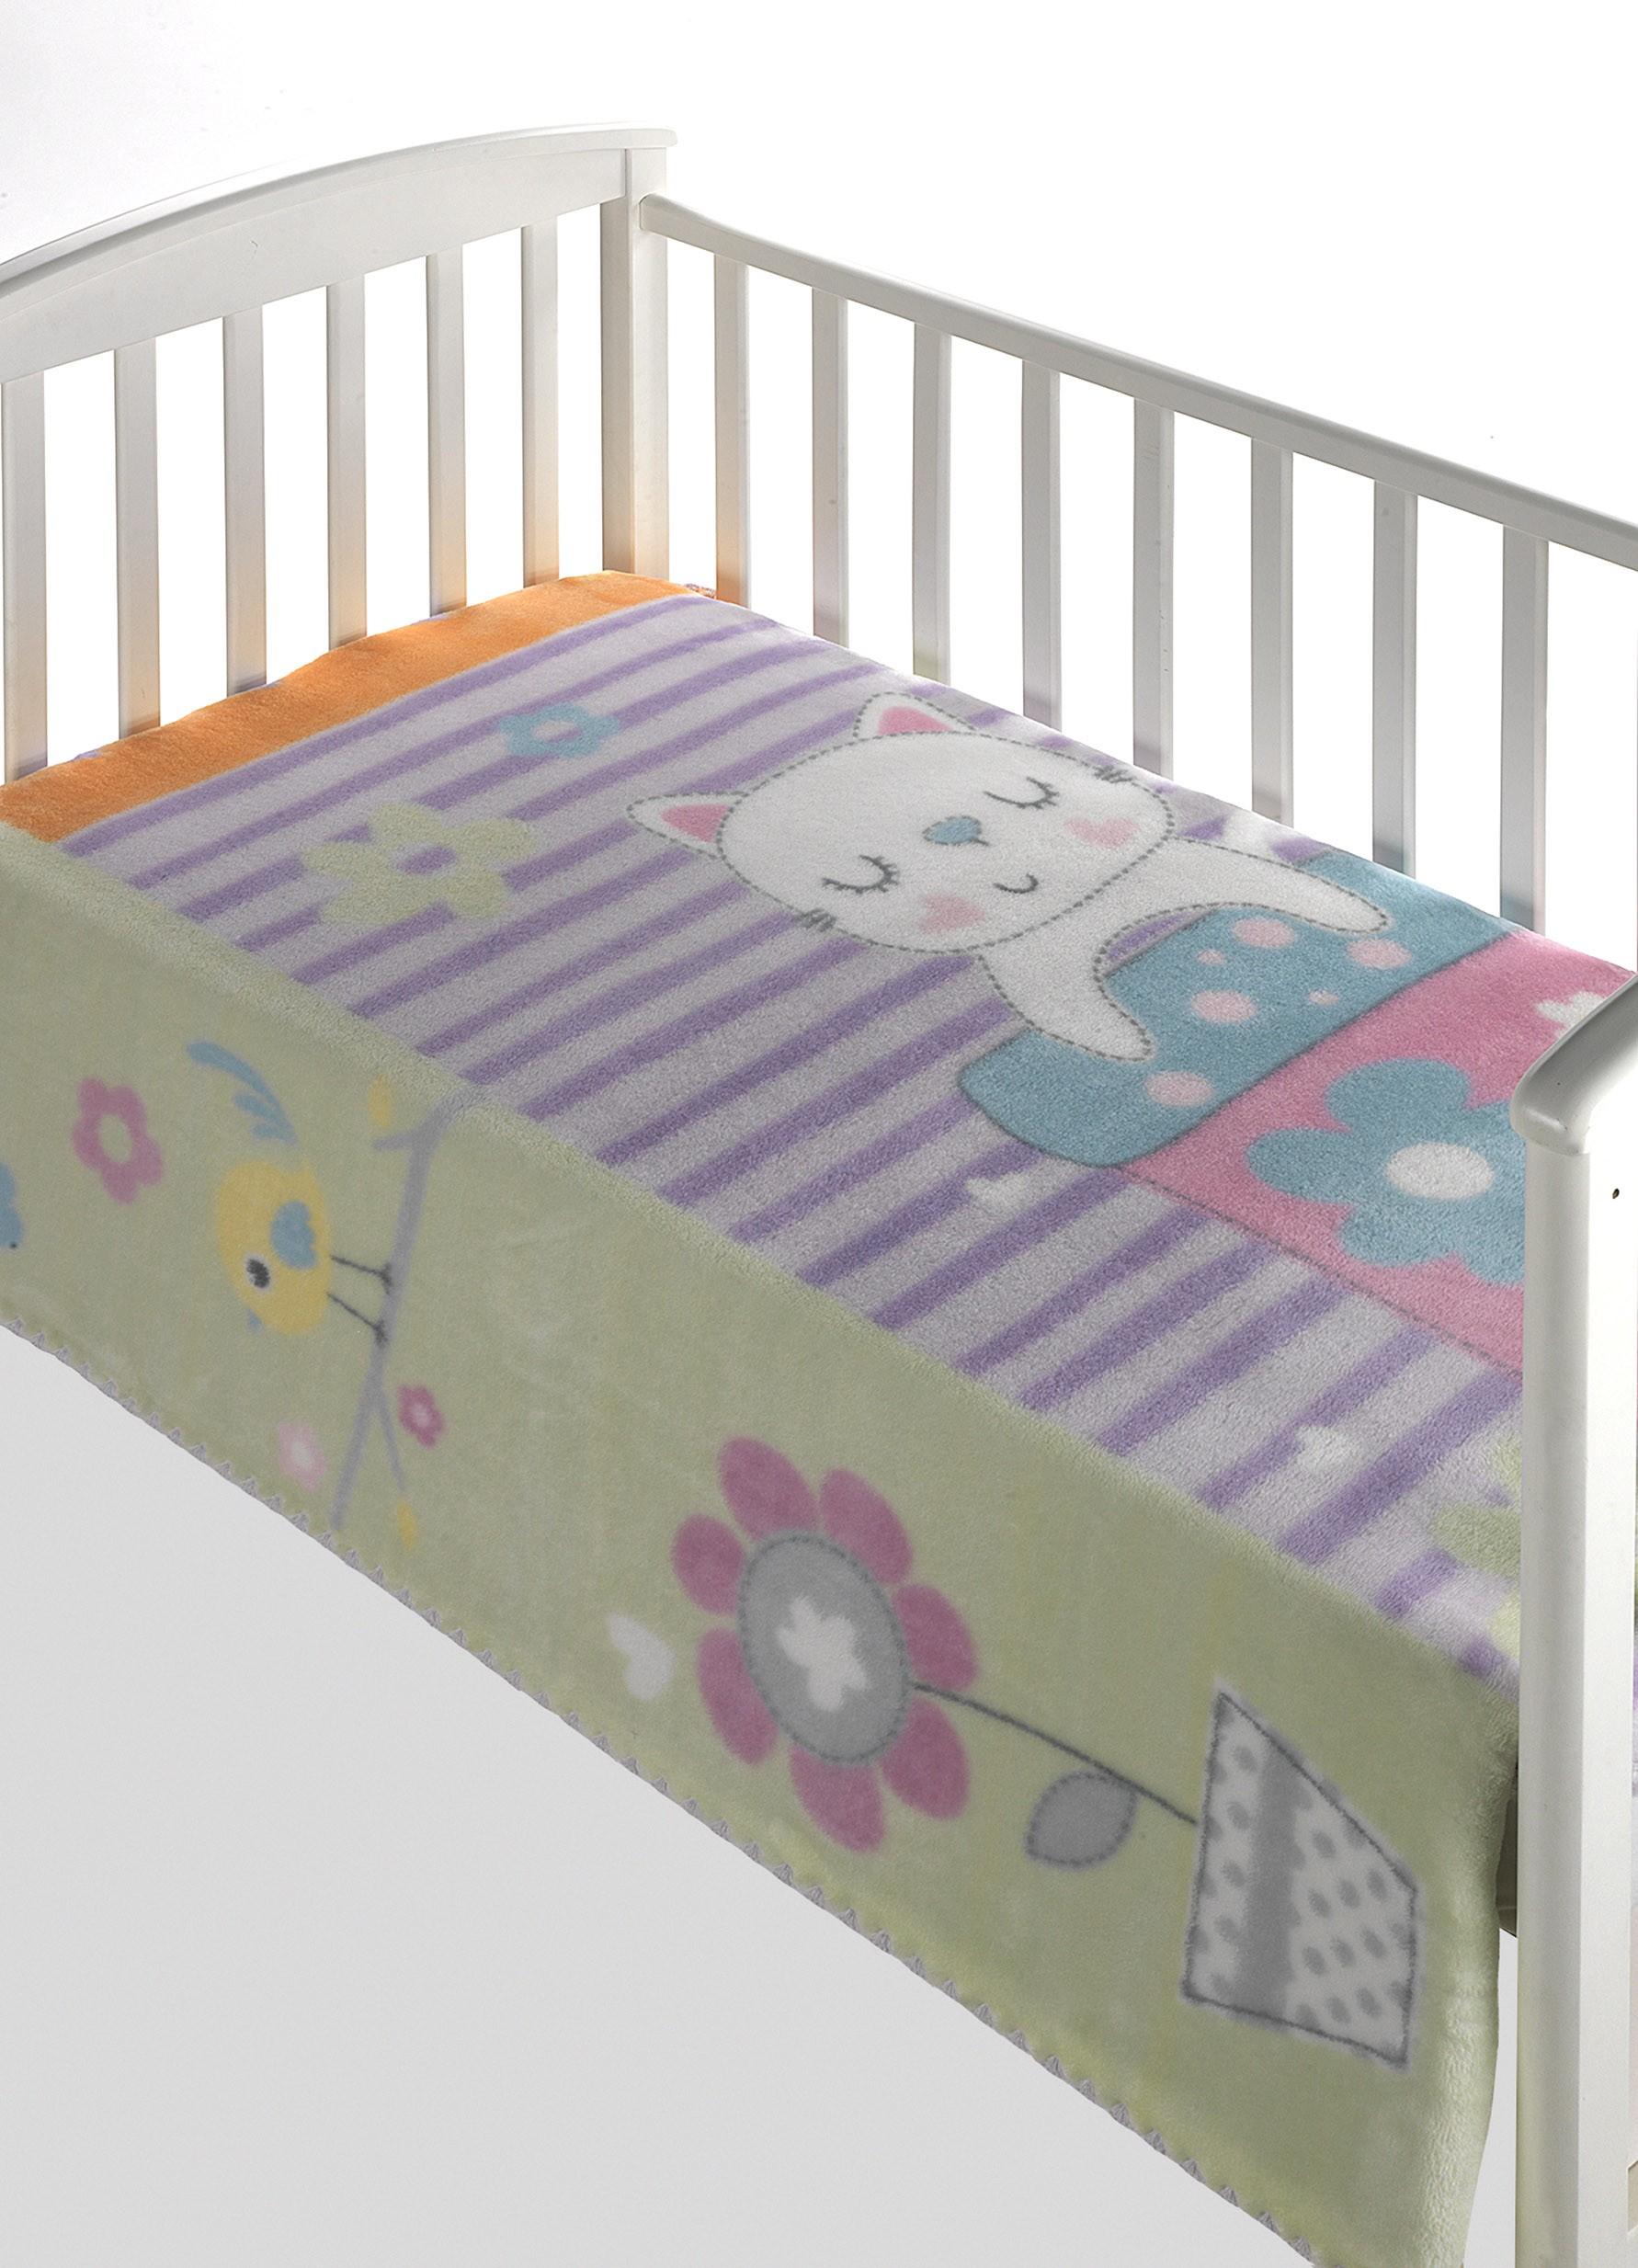 c83d30feb3d -15% Spiti Shop Κουβέρτα Βελουτέ Κούνιας Morven Magic Baby 303 Λιλά